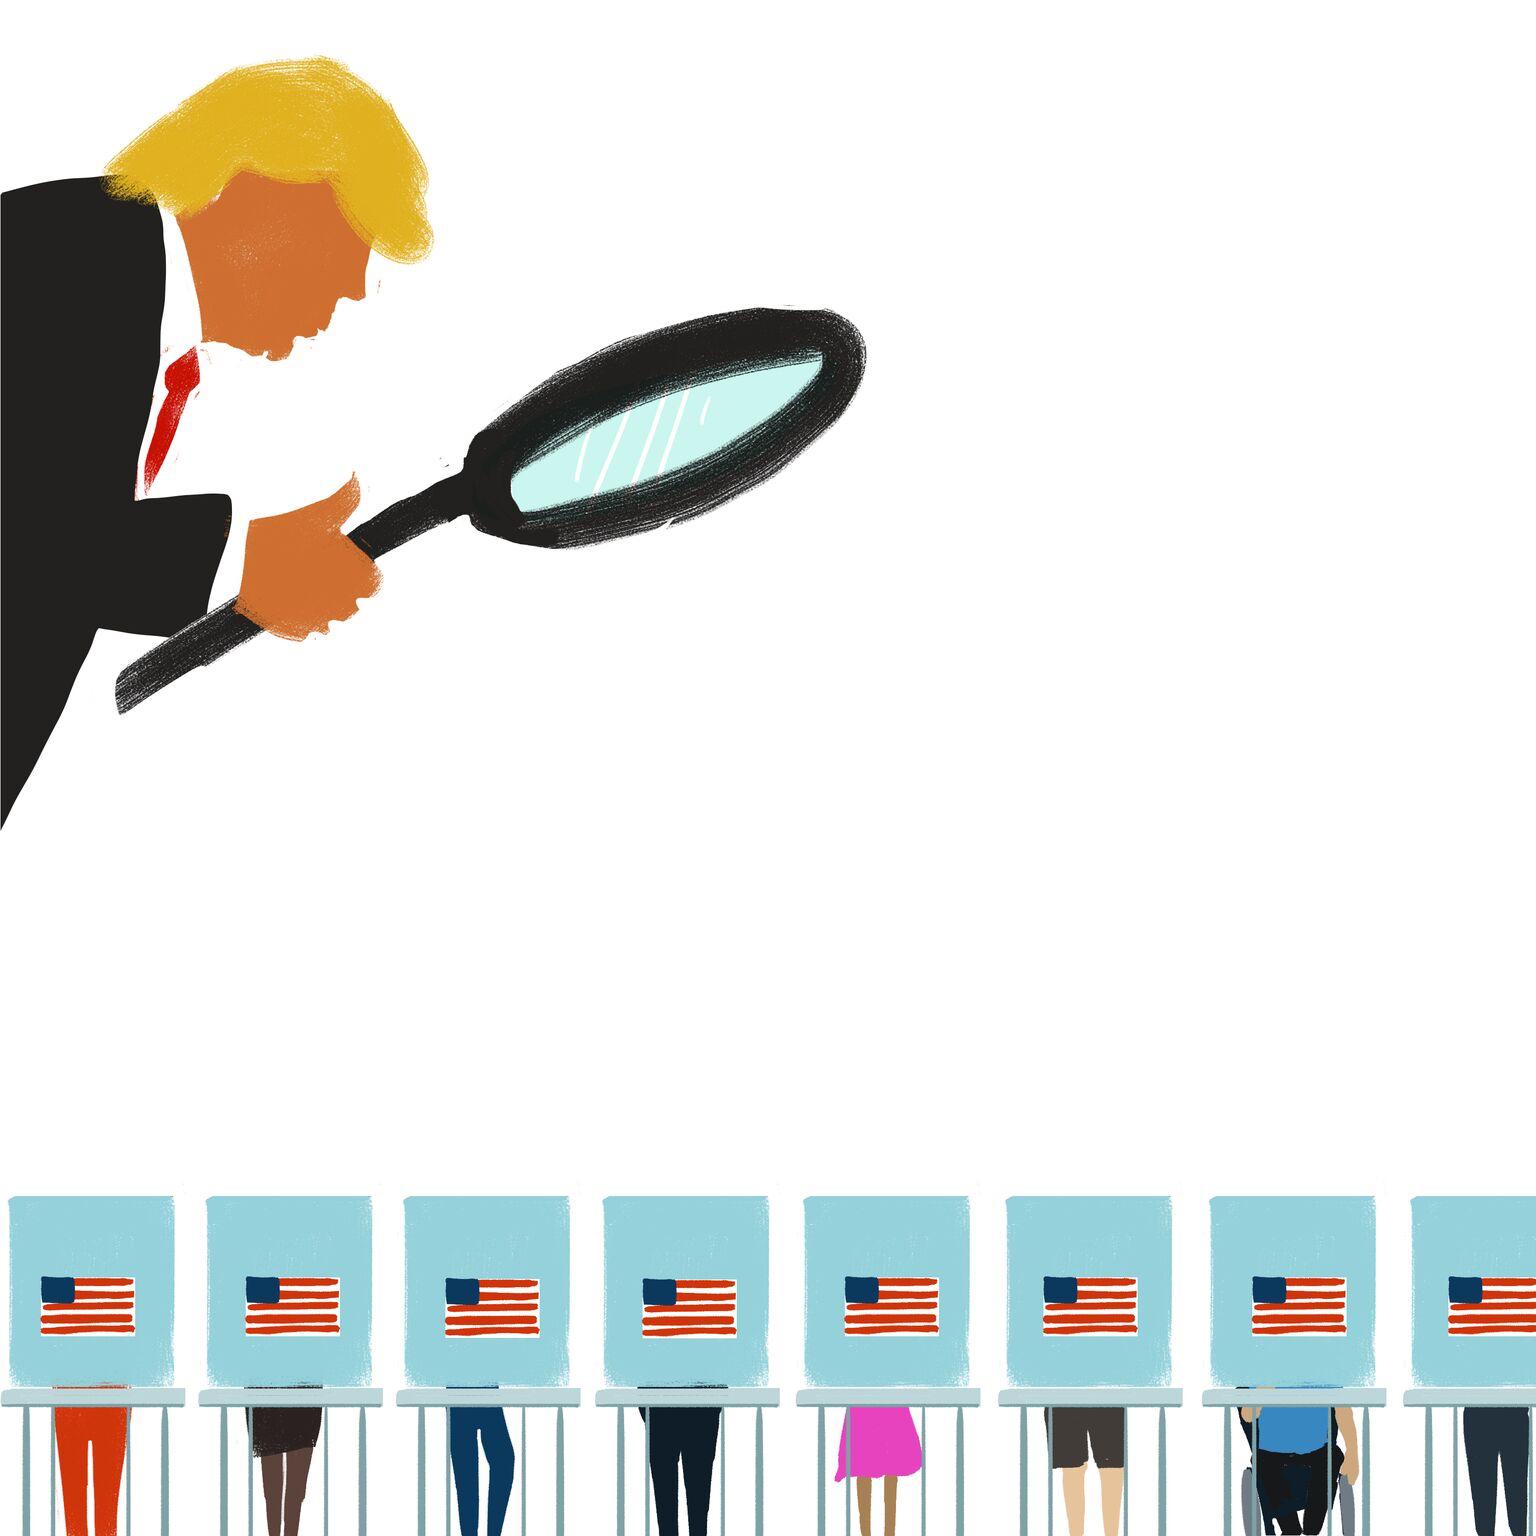 Trump investigates elections